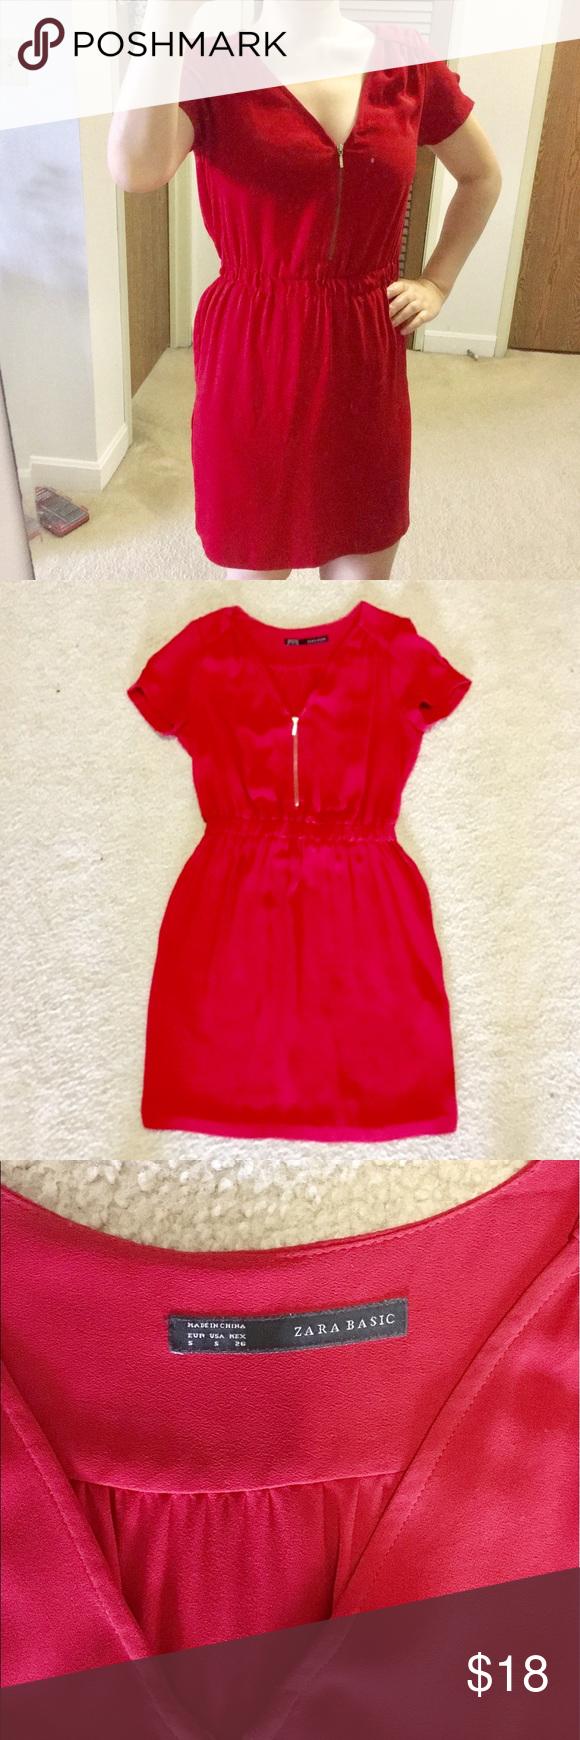 Zara zip up red dress zara dresses customer support and